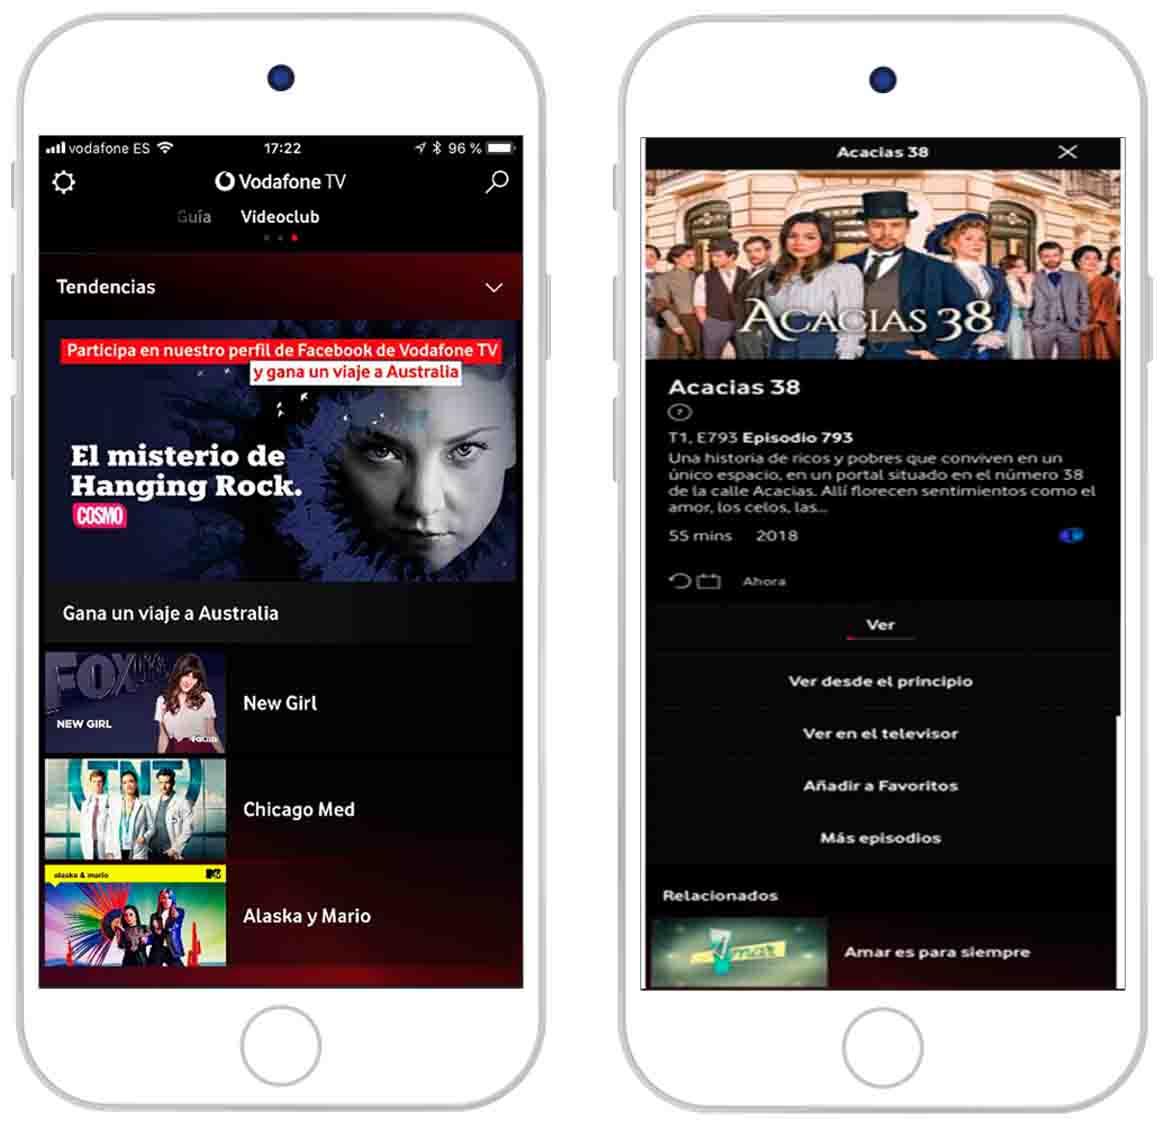 Imagen Vodafone TV